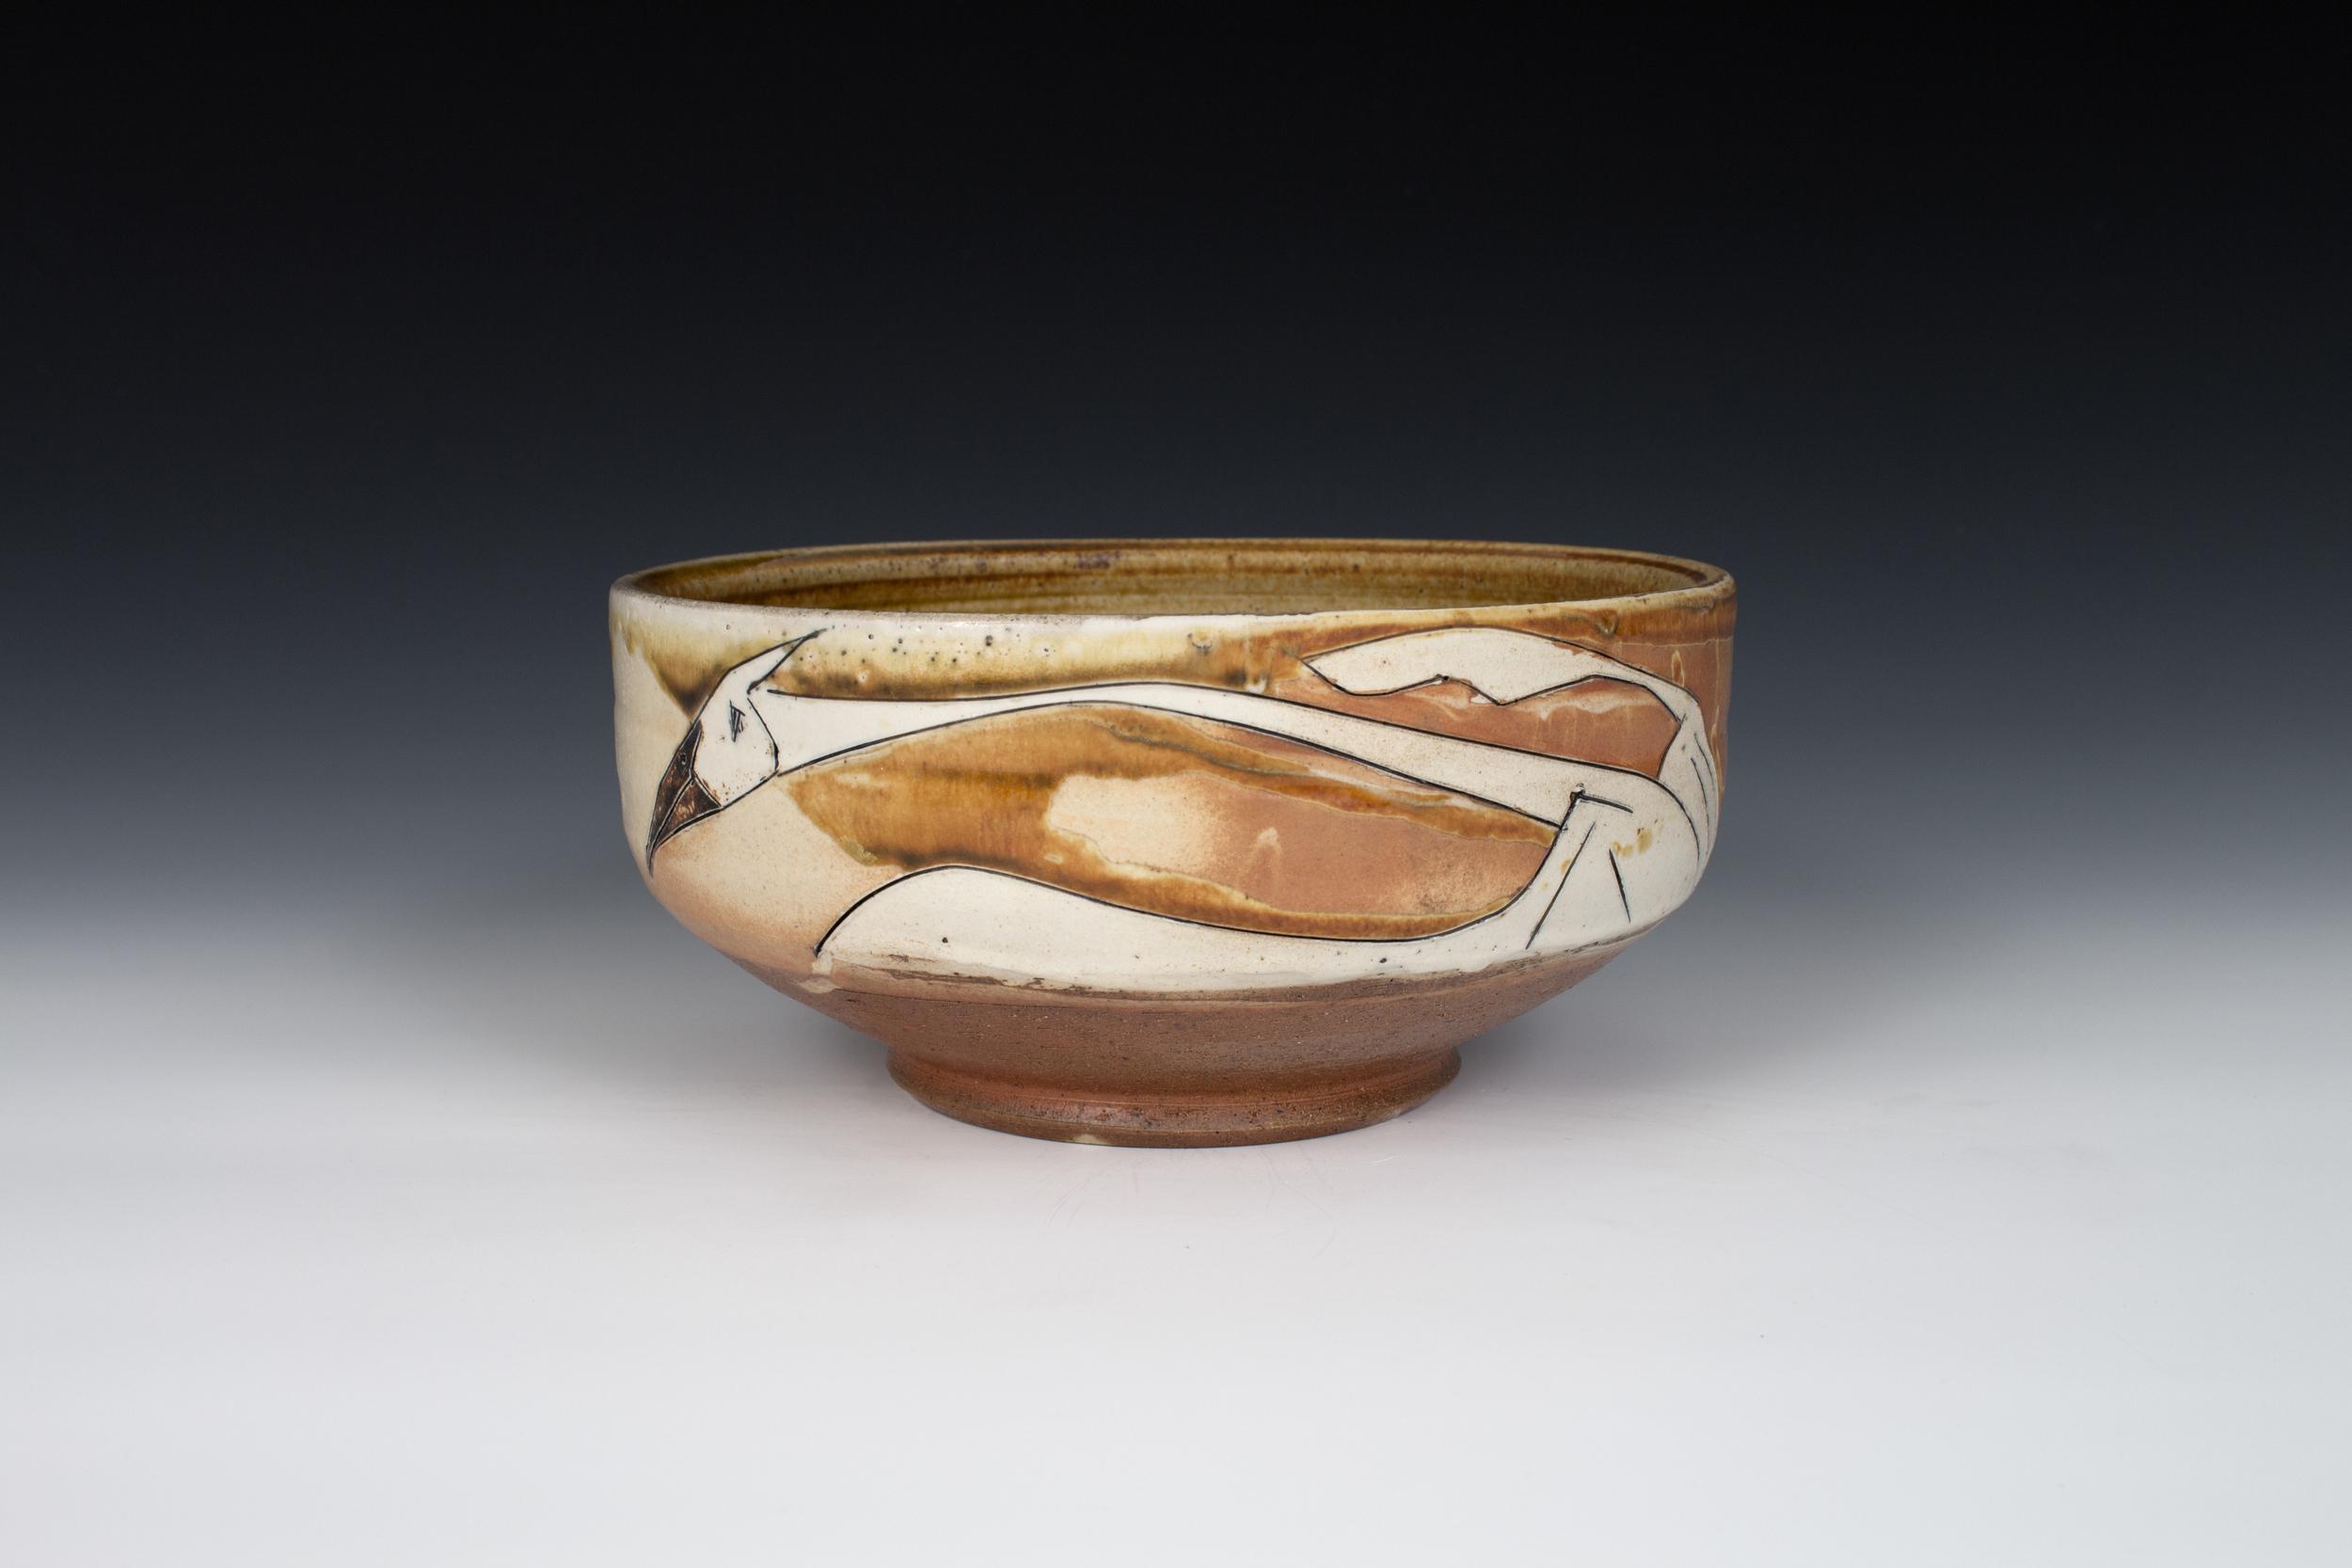 Sandhill Crane Serving Bowl